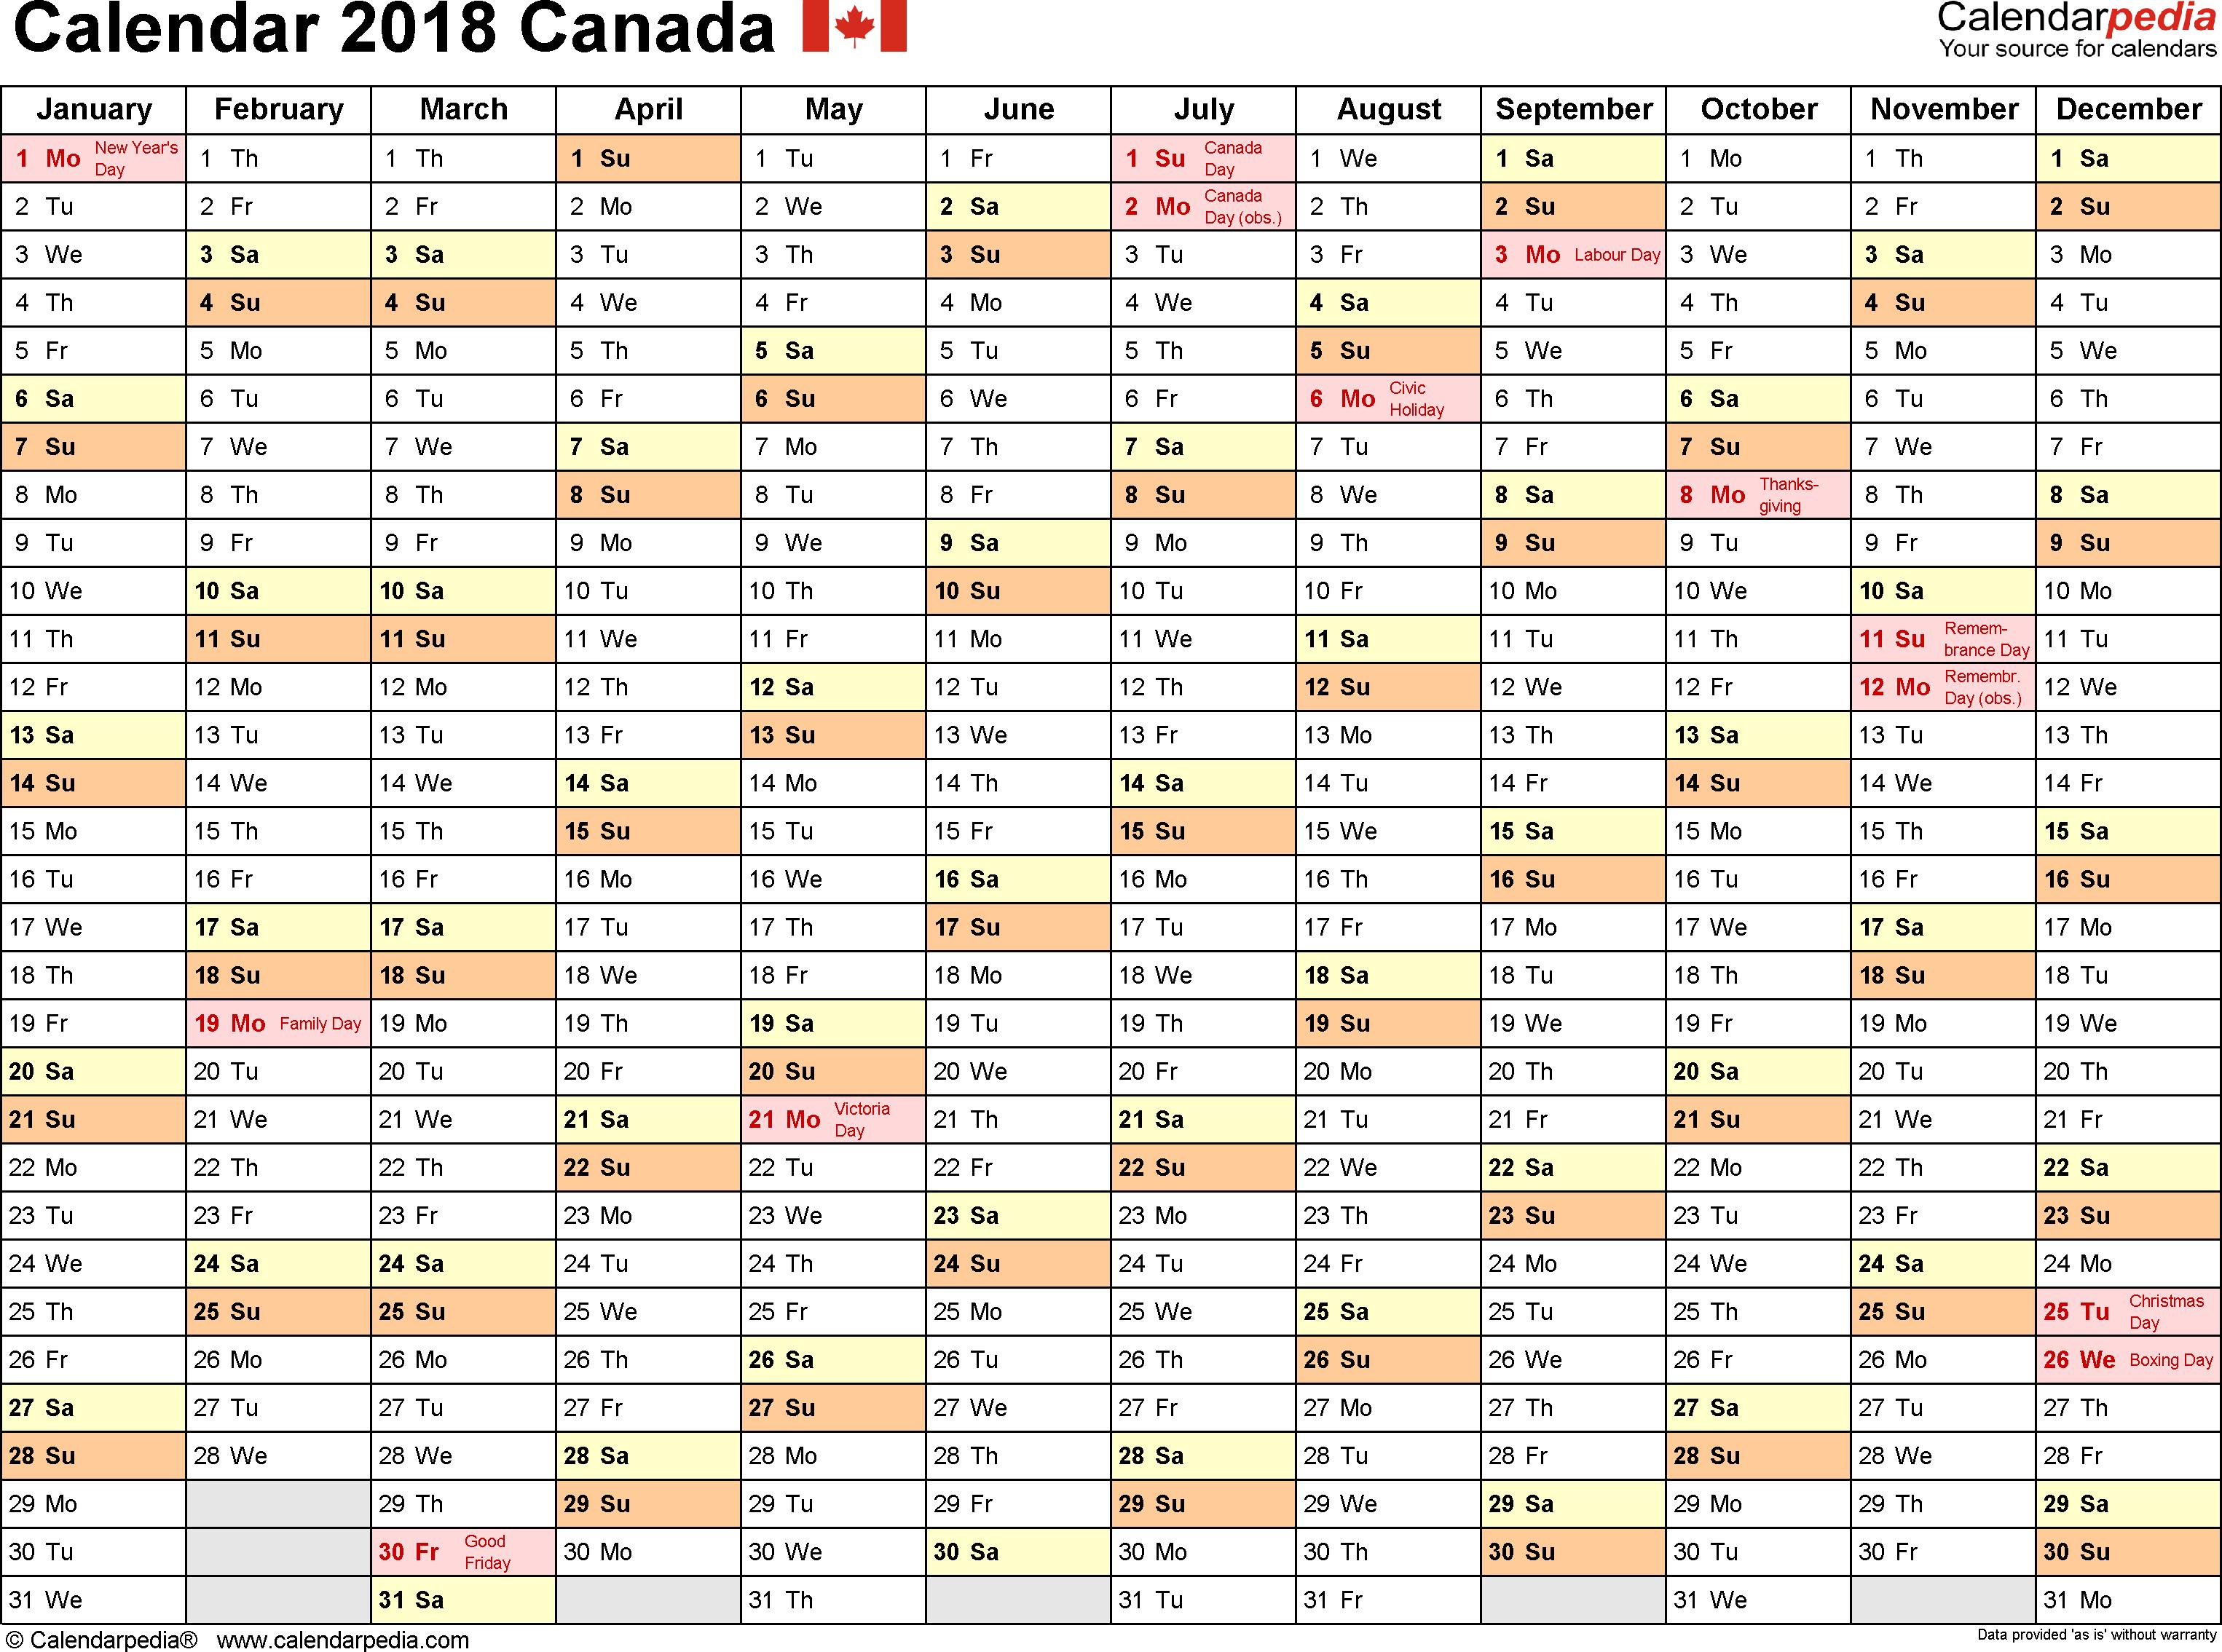 Canada Calendar 2018 free printable PDF templates